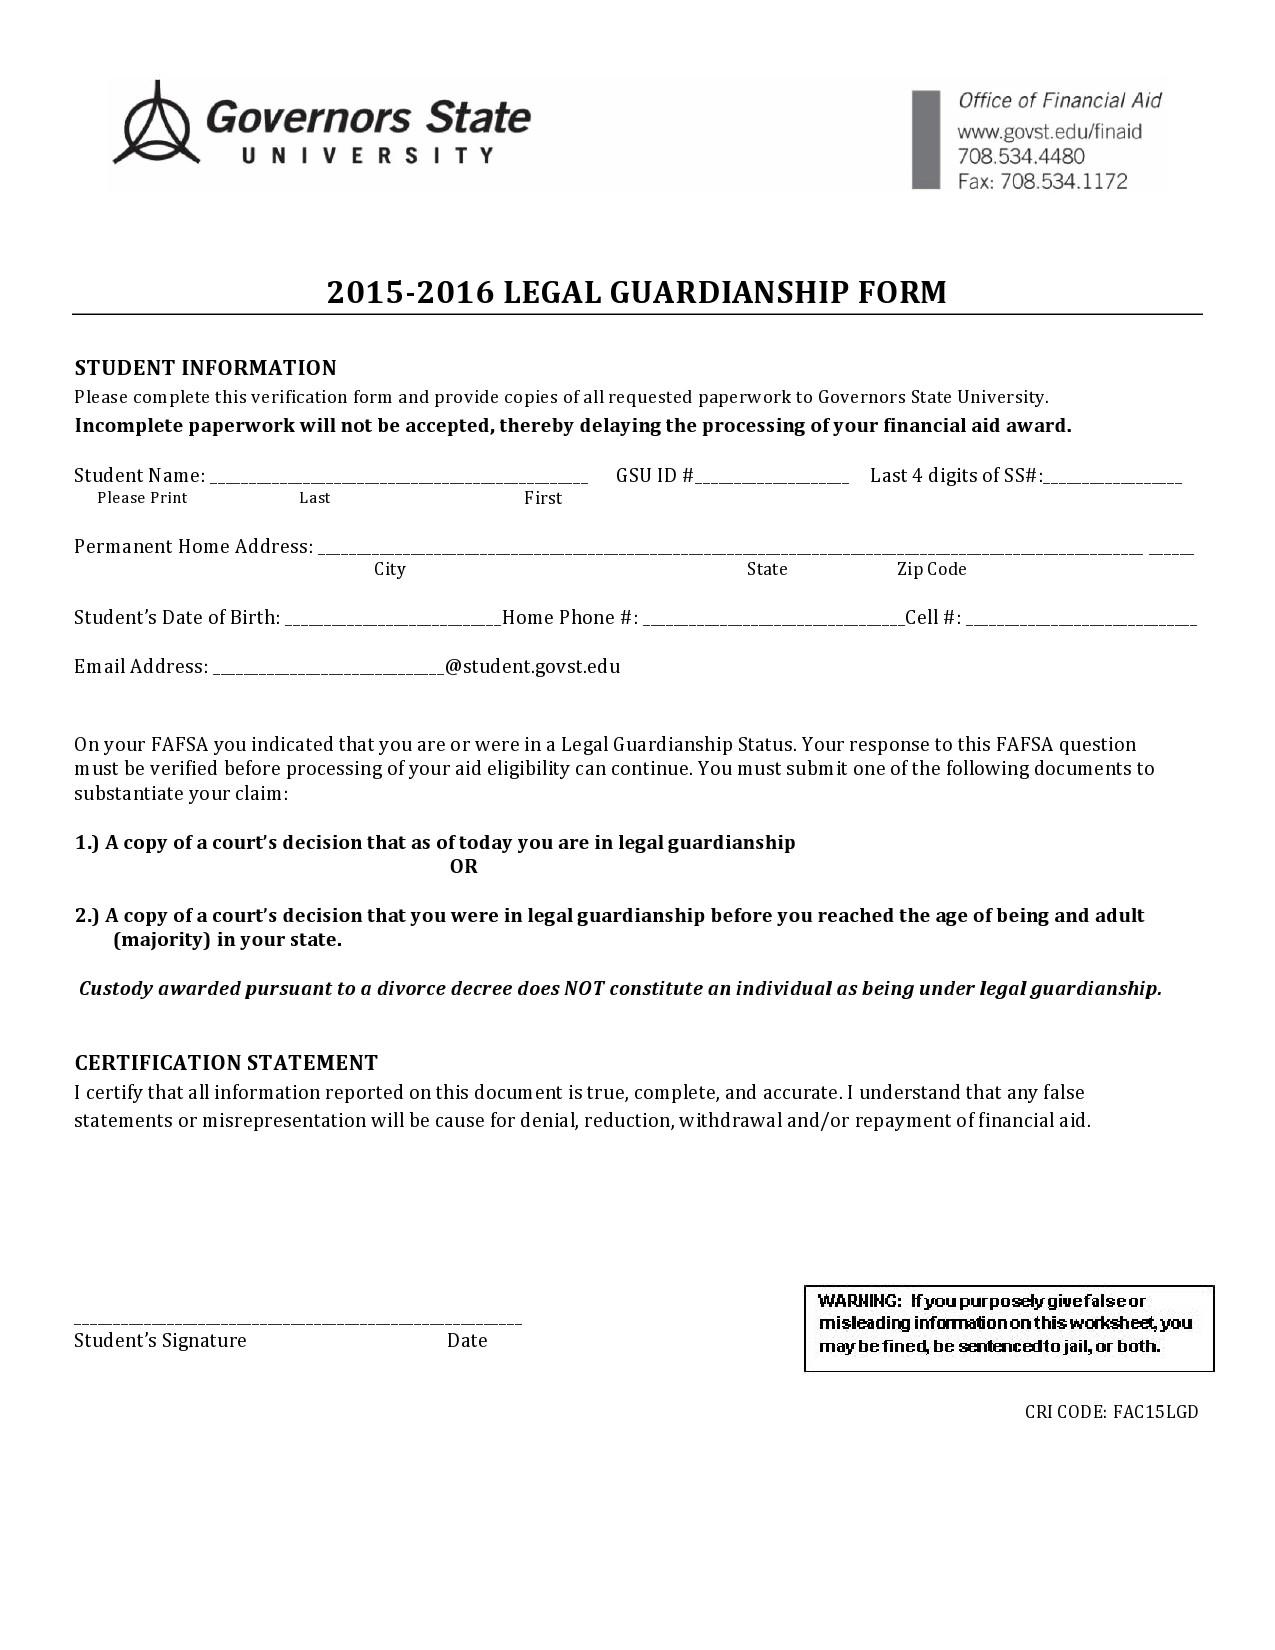 Free guardianship form 34